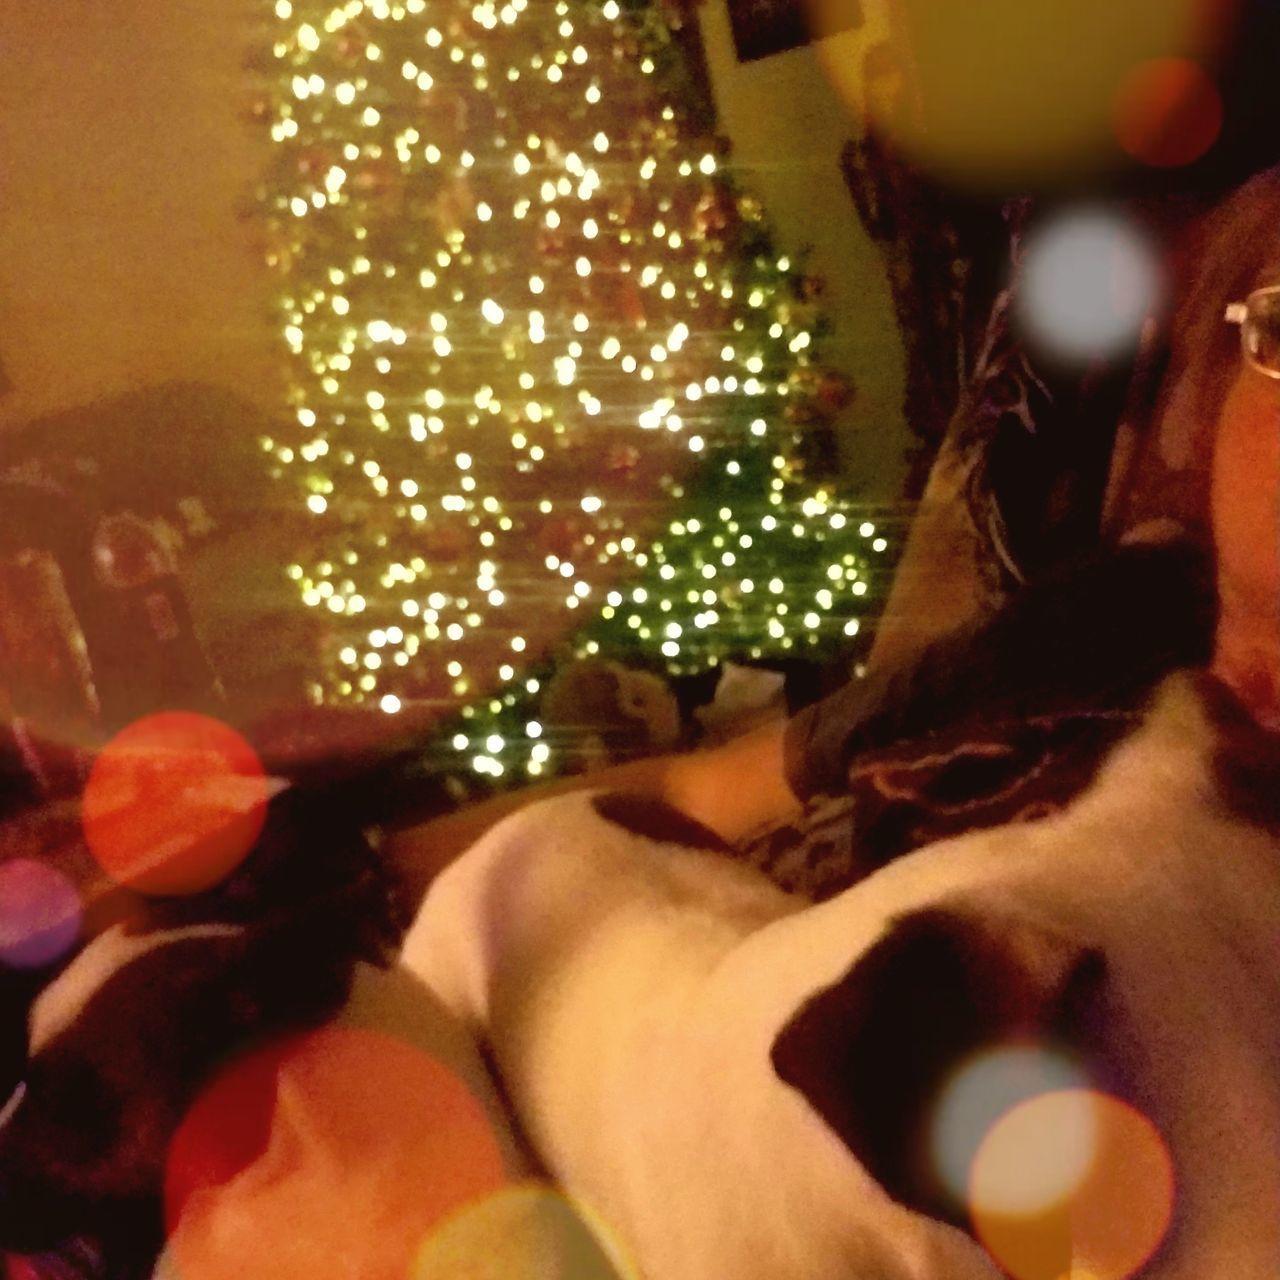 CLOSE-UP OF ILLUMINATED CHRISTMAS LIGHTS ON BED